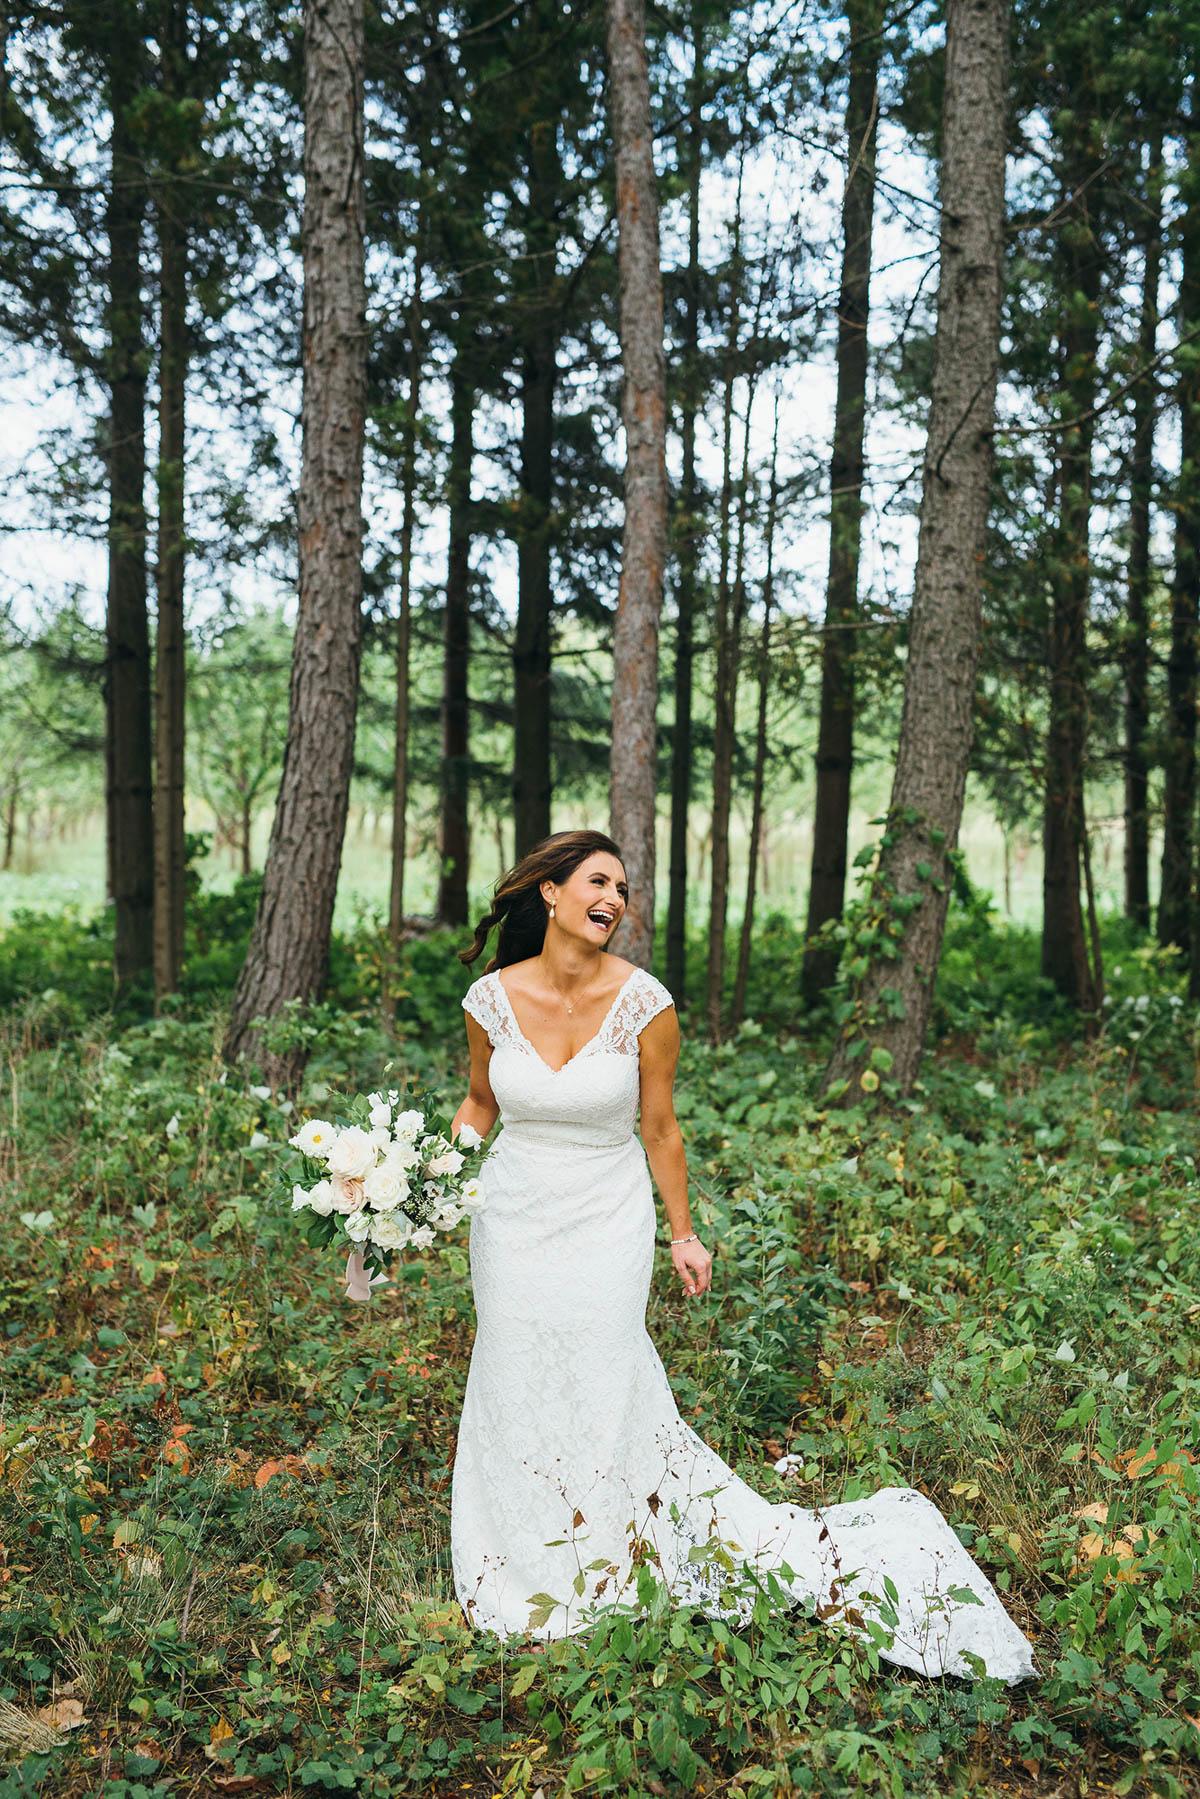 shaw-events-vineyard-bride-swish-list-kurtz-orchards-niagara-on-the-lake-wedding-35.jpg